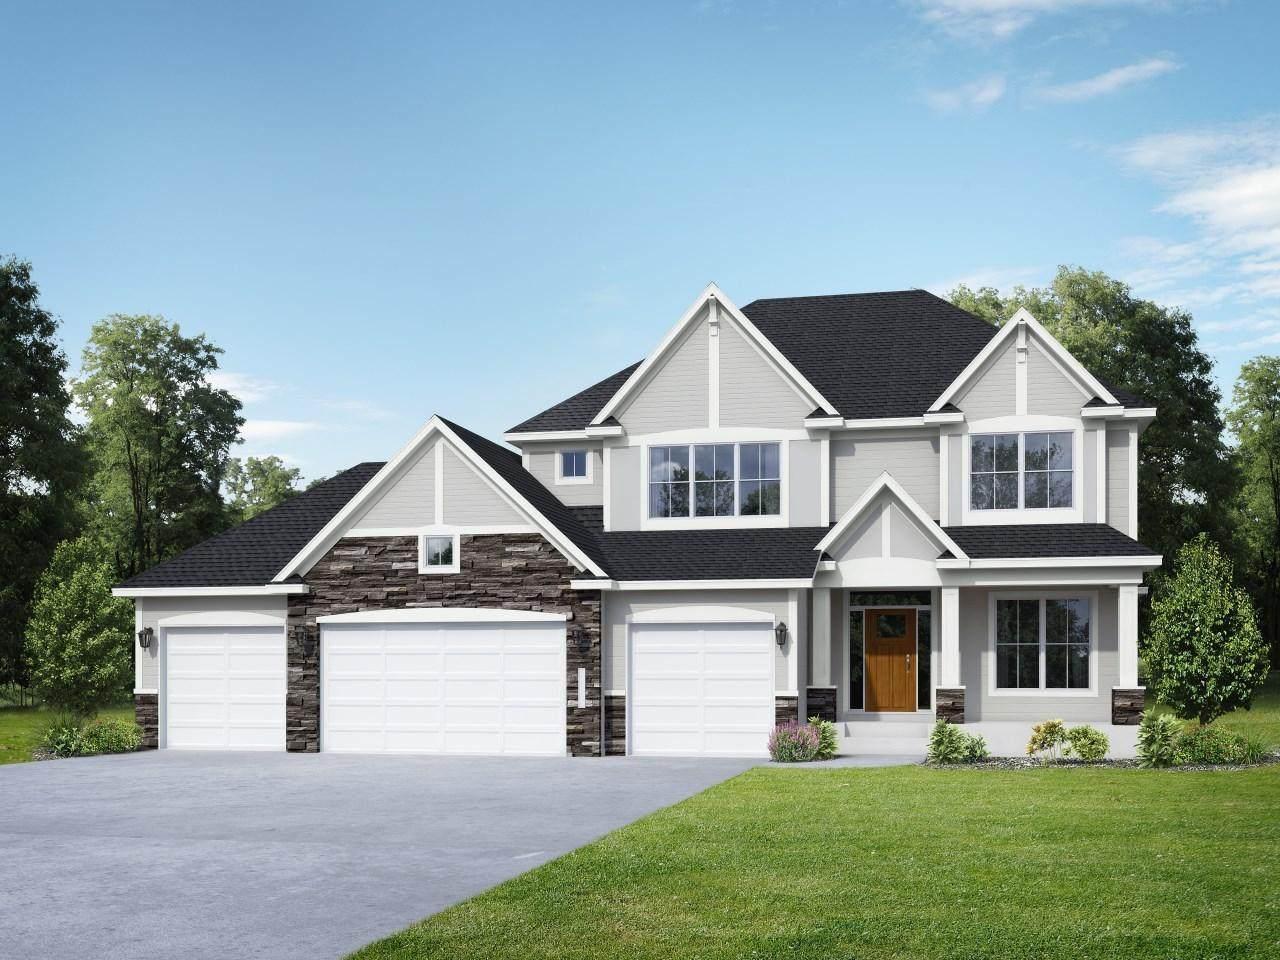 12913 Burr Oaks Lane - Photo 1